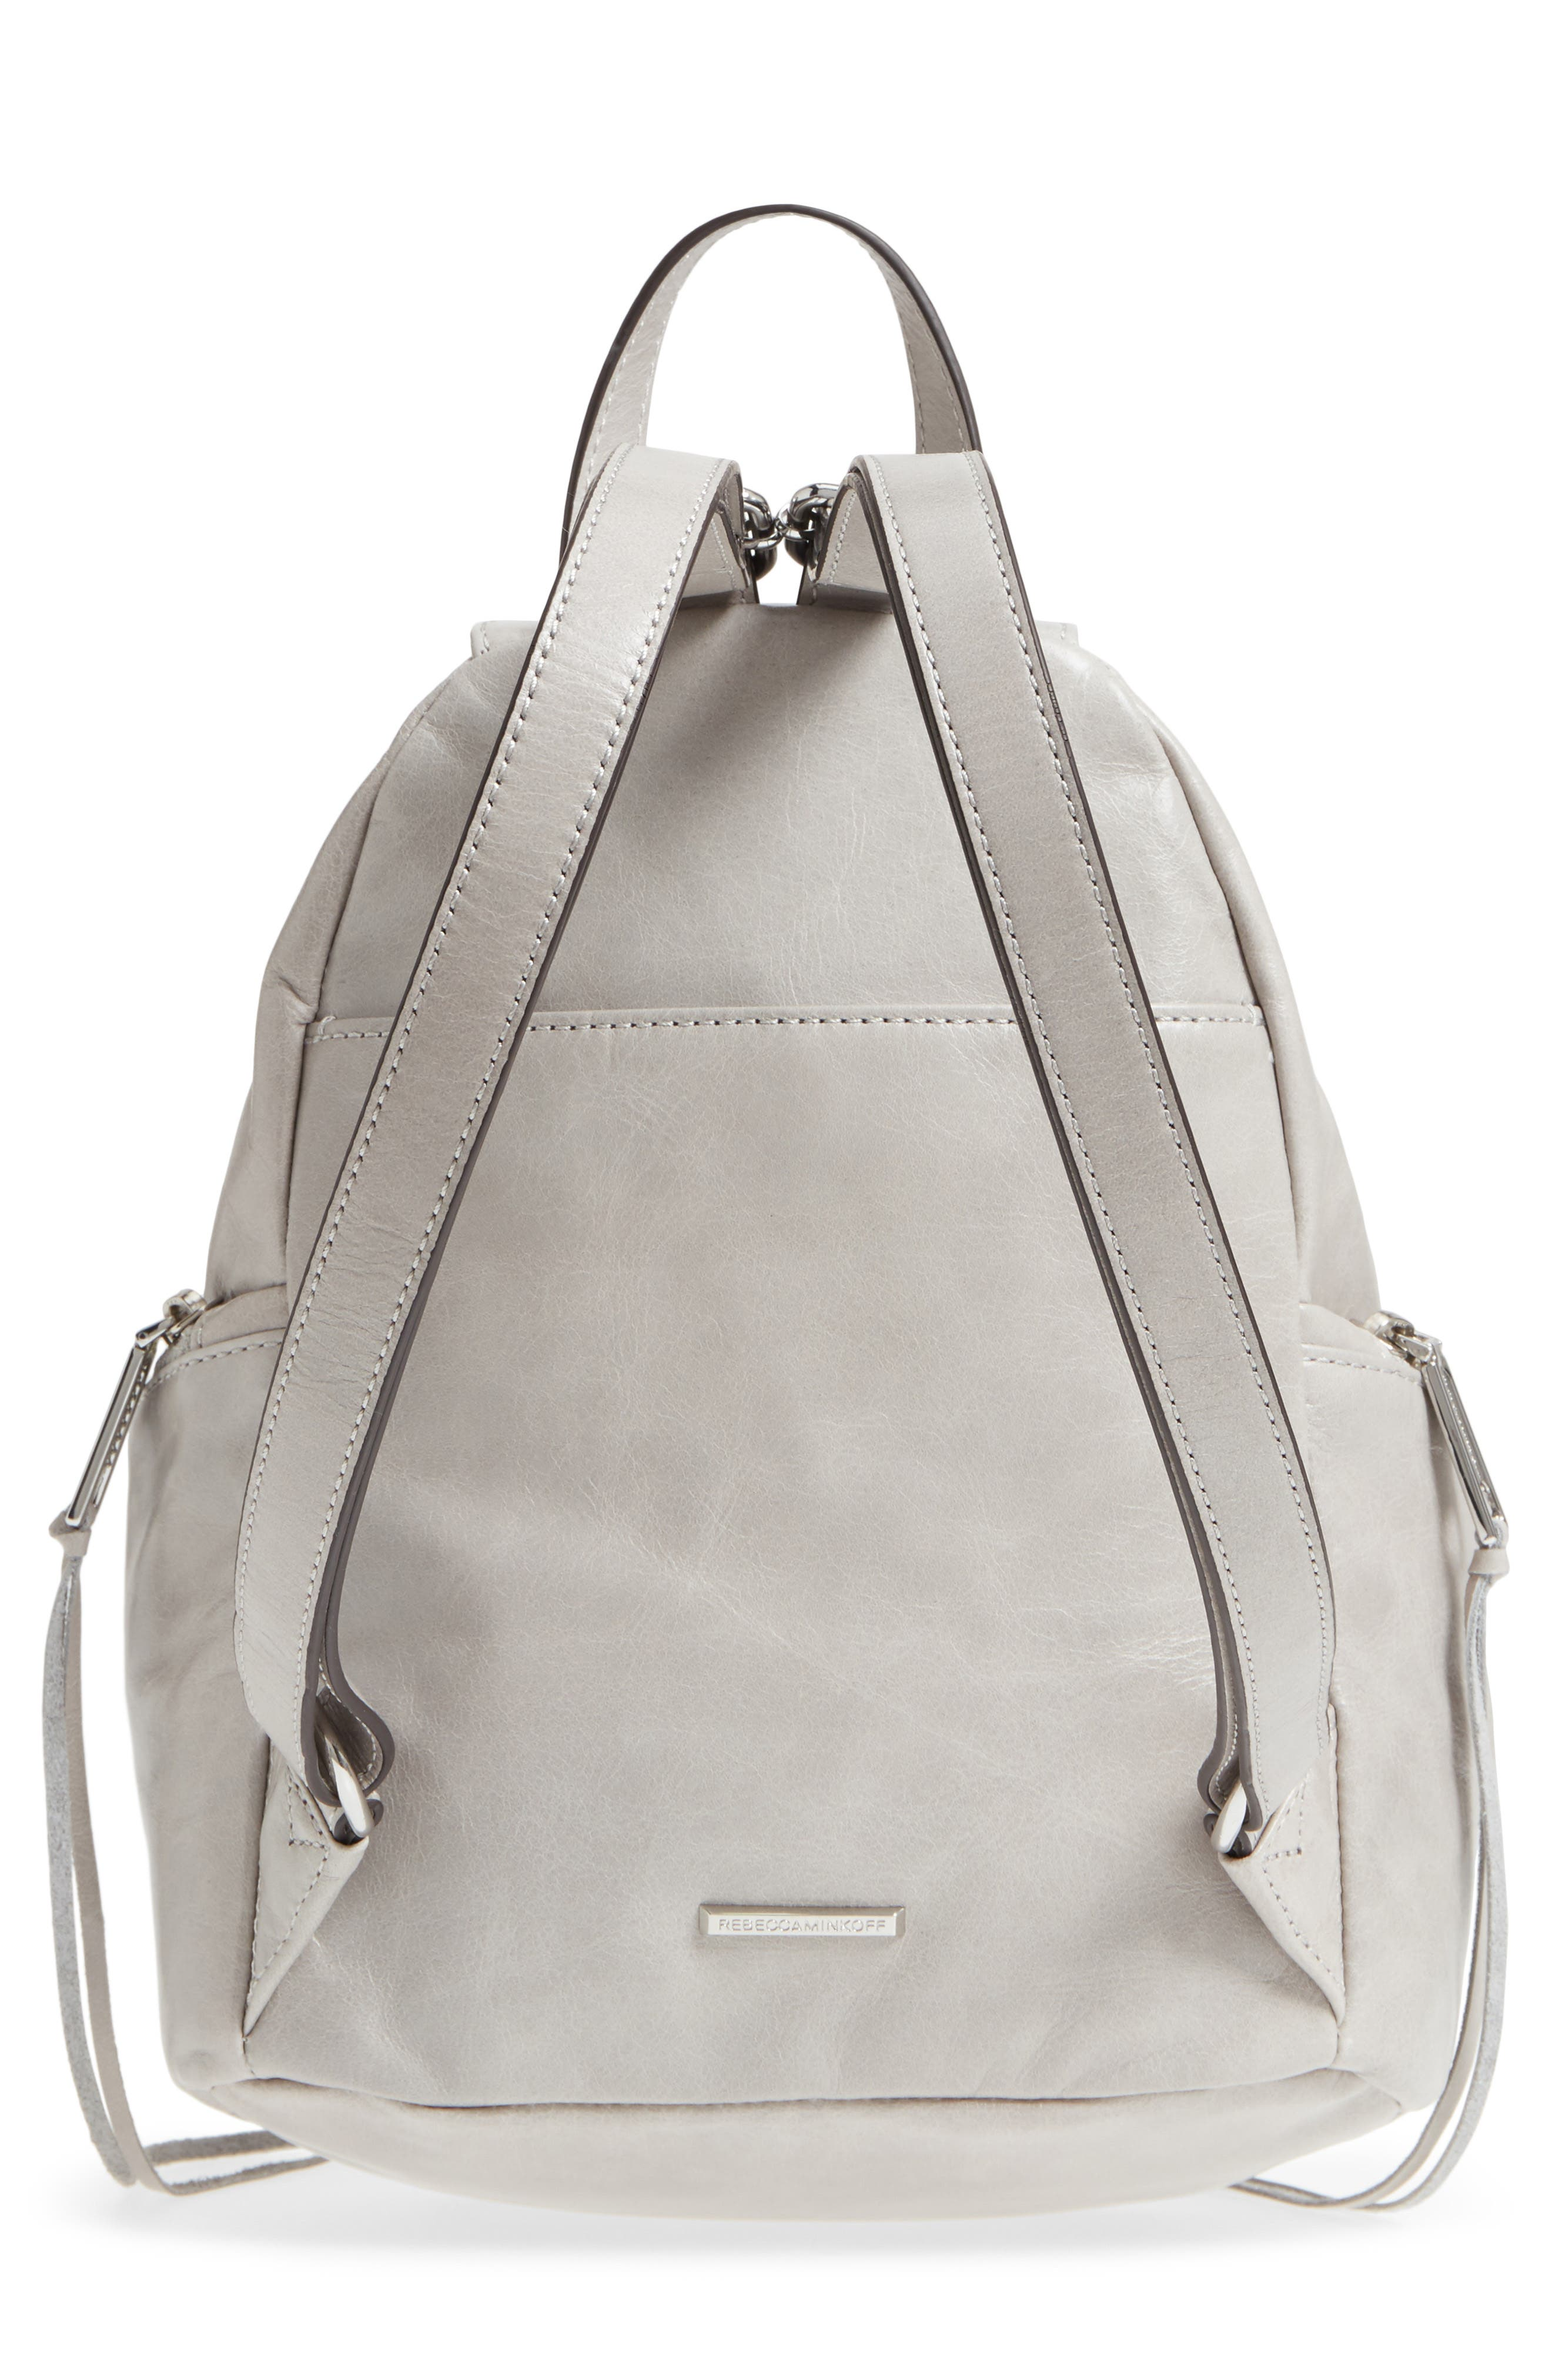 Medium Julian Leather Backpack,                             Alternate thumbnail 3, color,